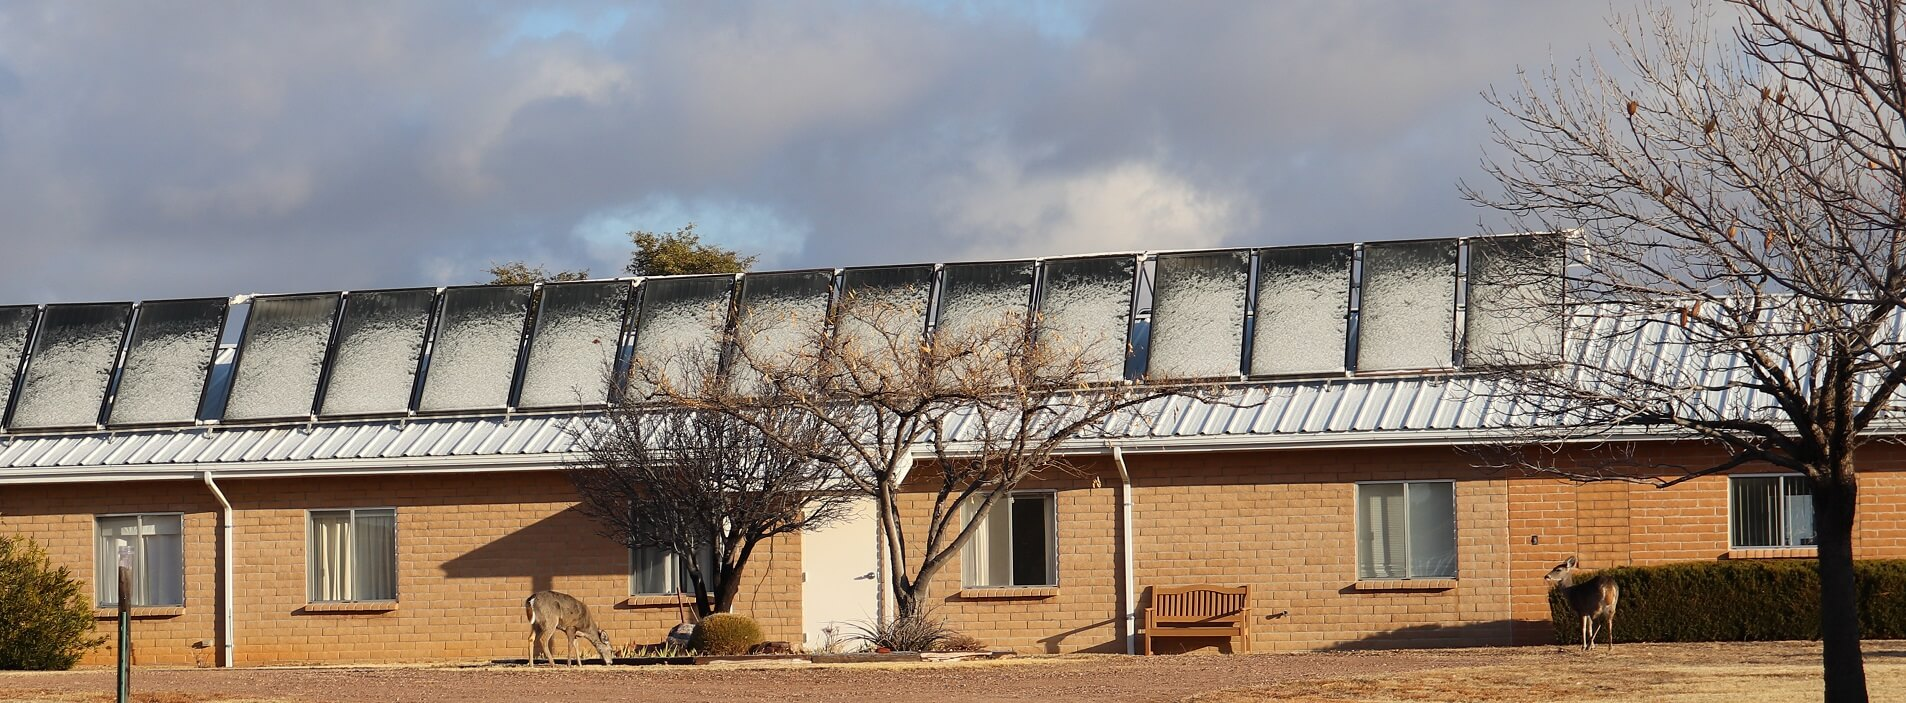 Image 3 – 2020 02 07 snowy solar panels